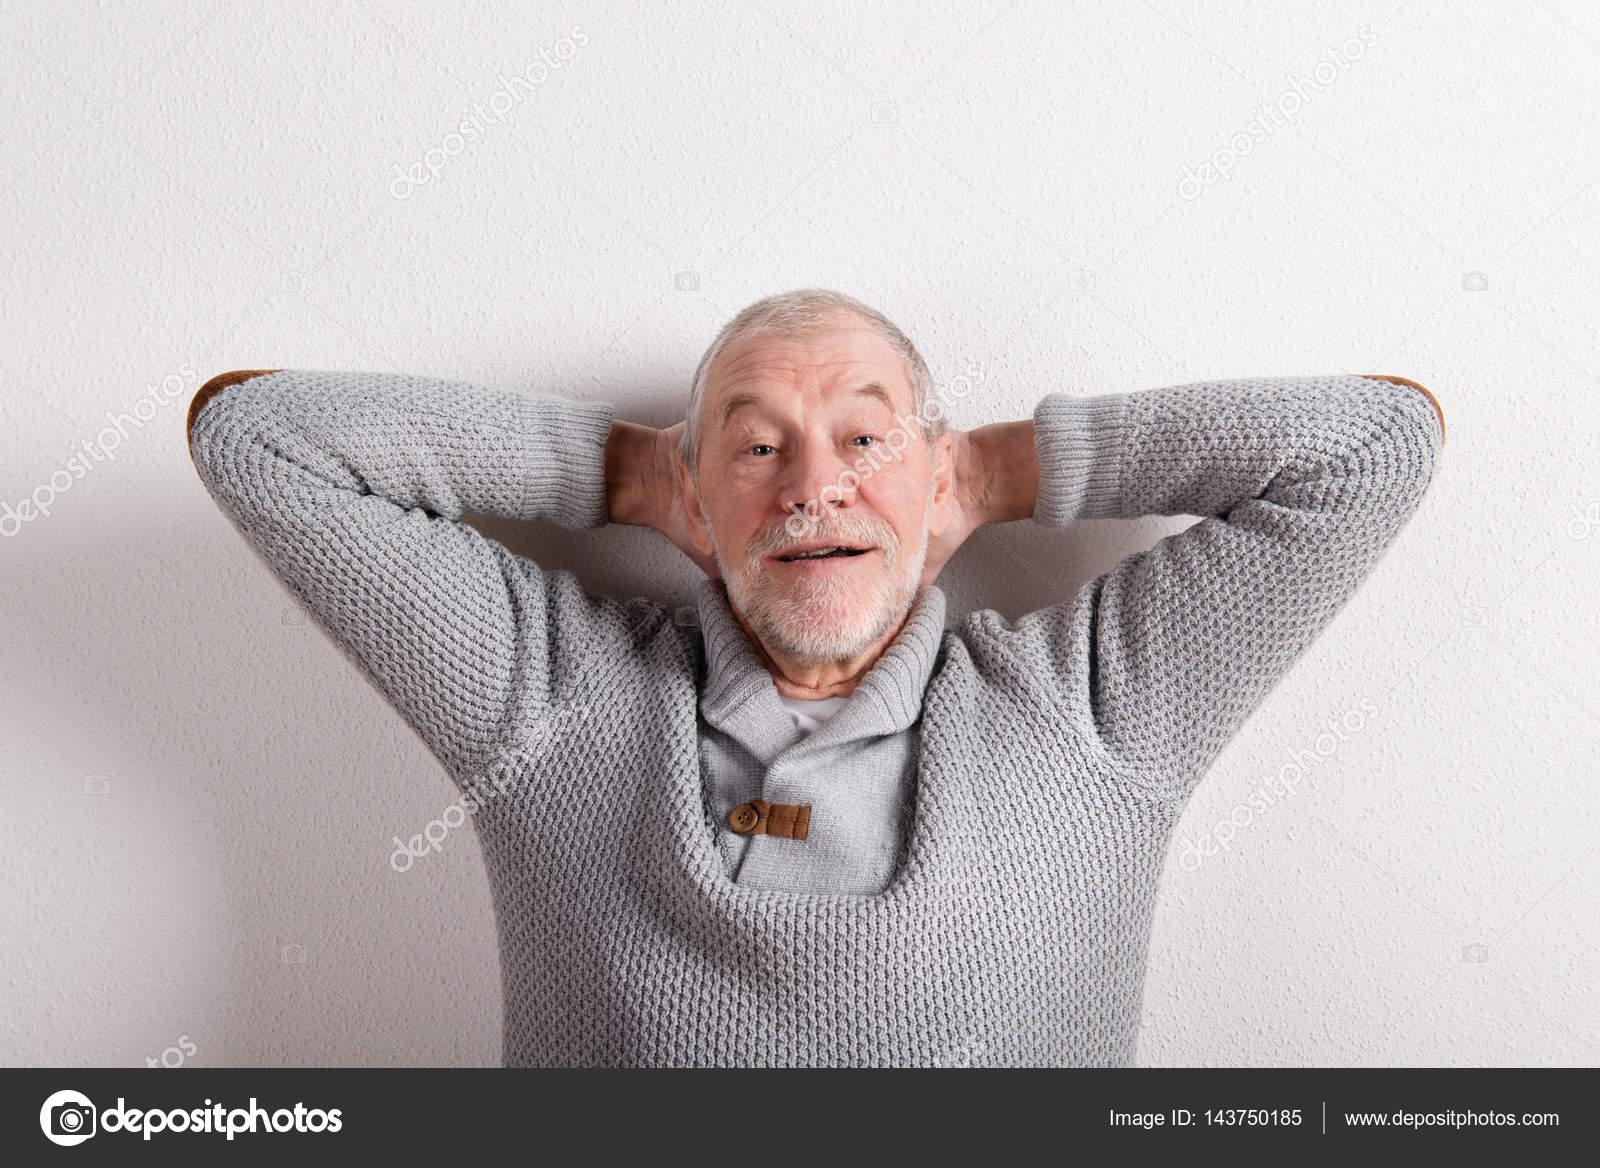 d28c90f0e1c8 Ανώτερος άνθρωπος σε γκρι μάλλινο πουλόβερ